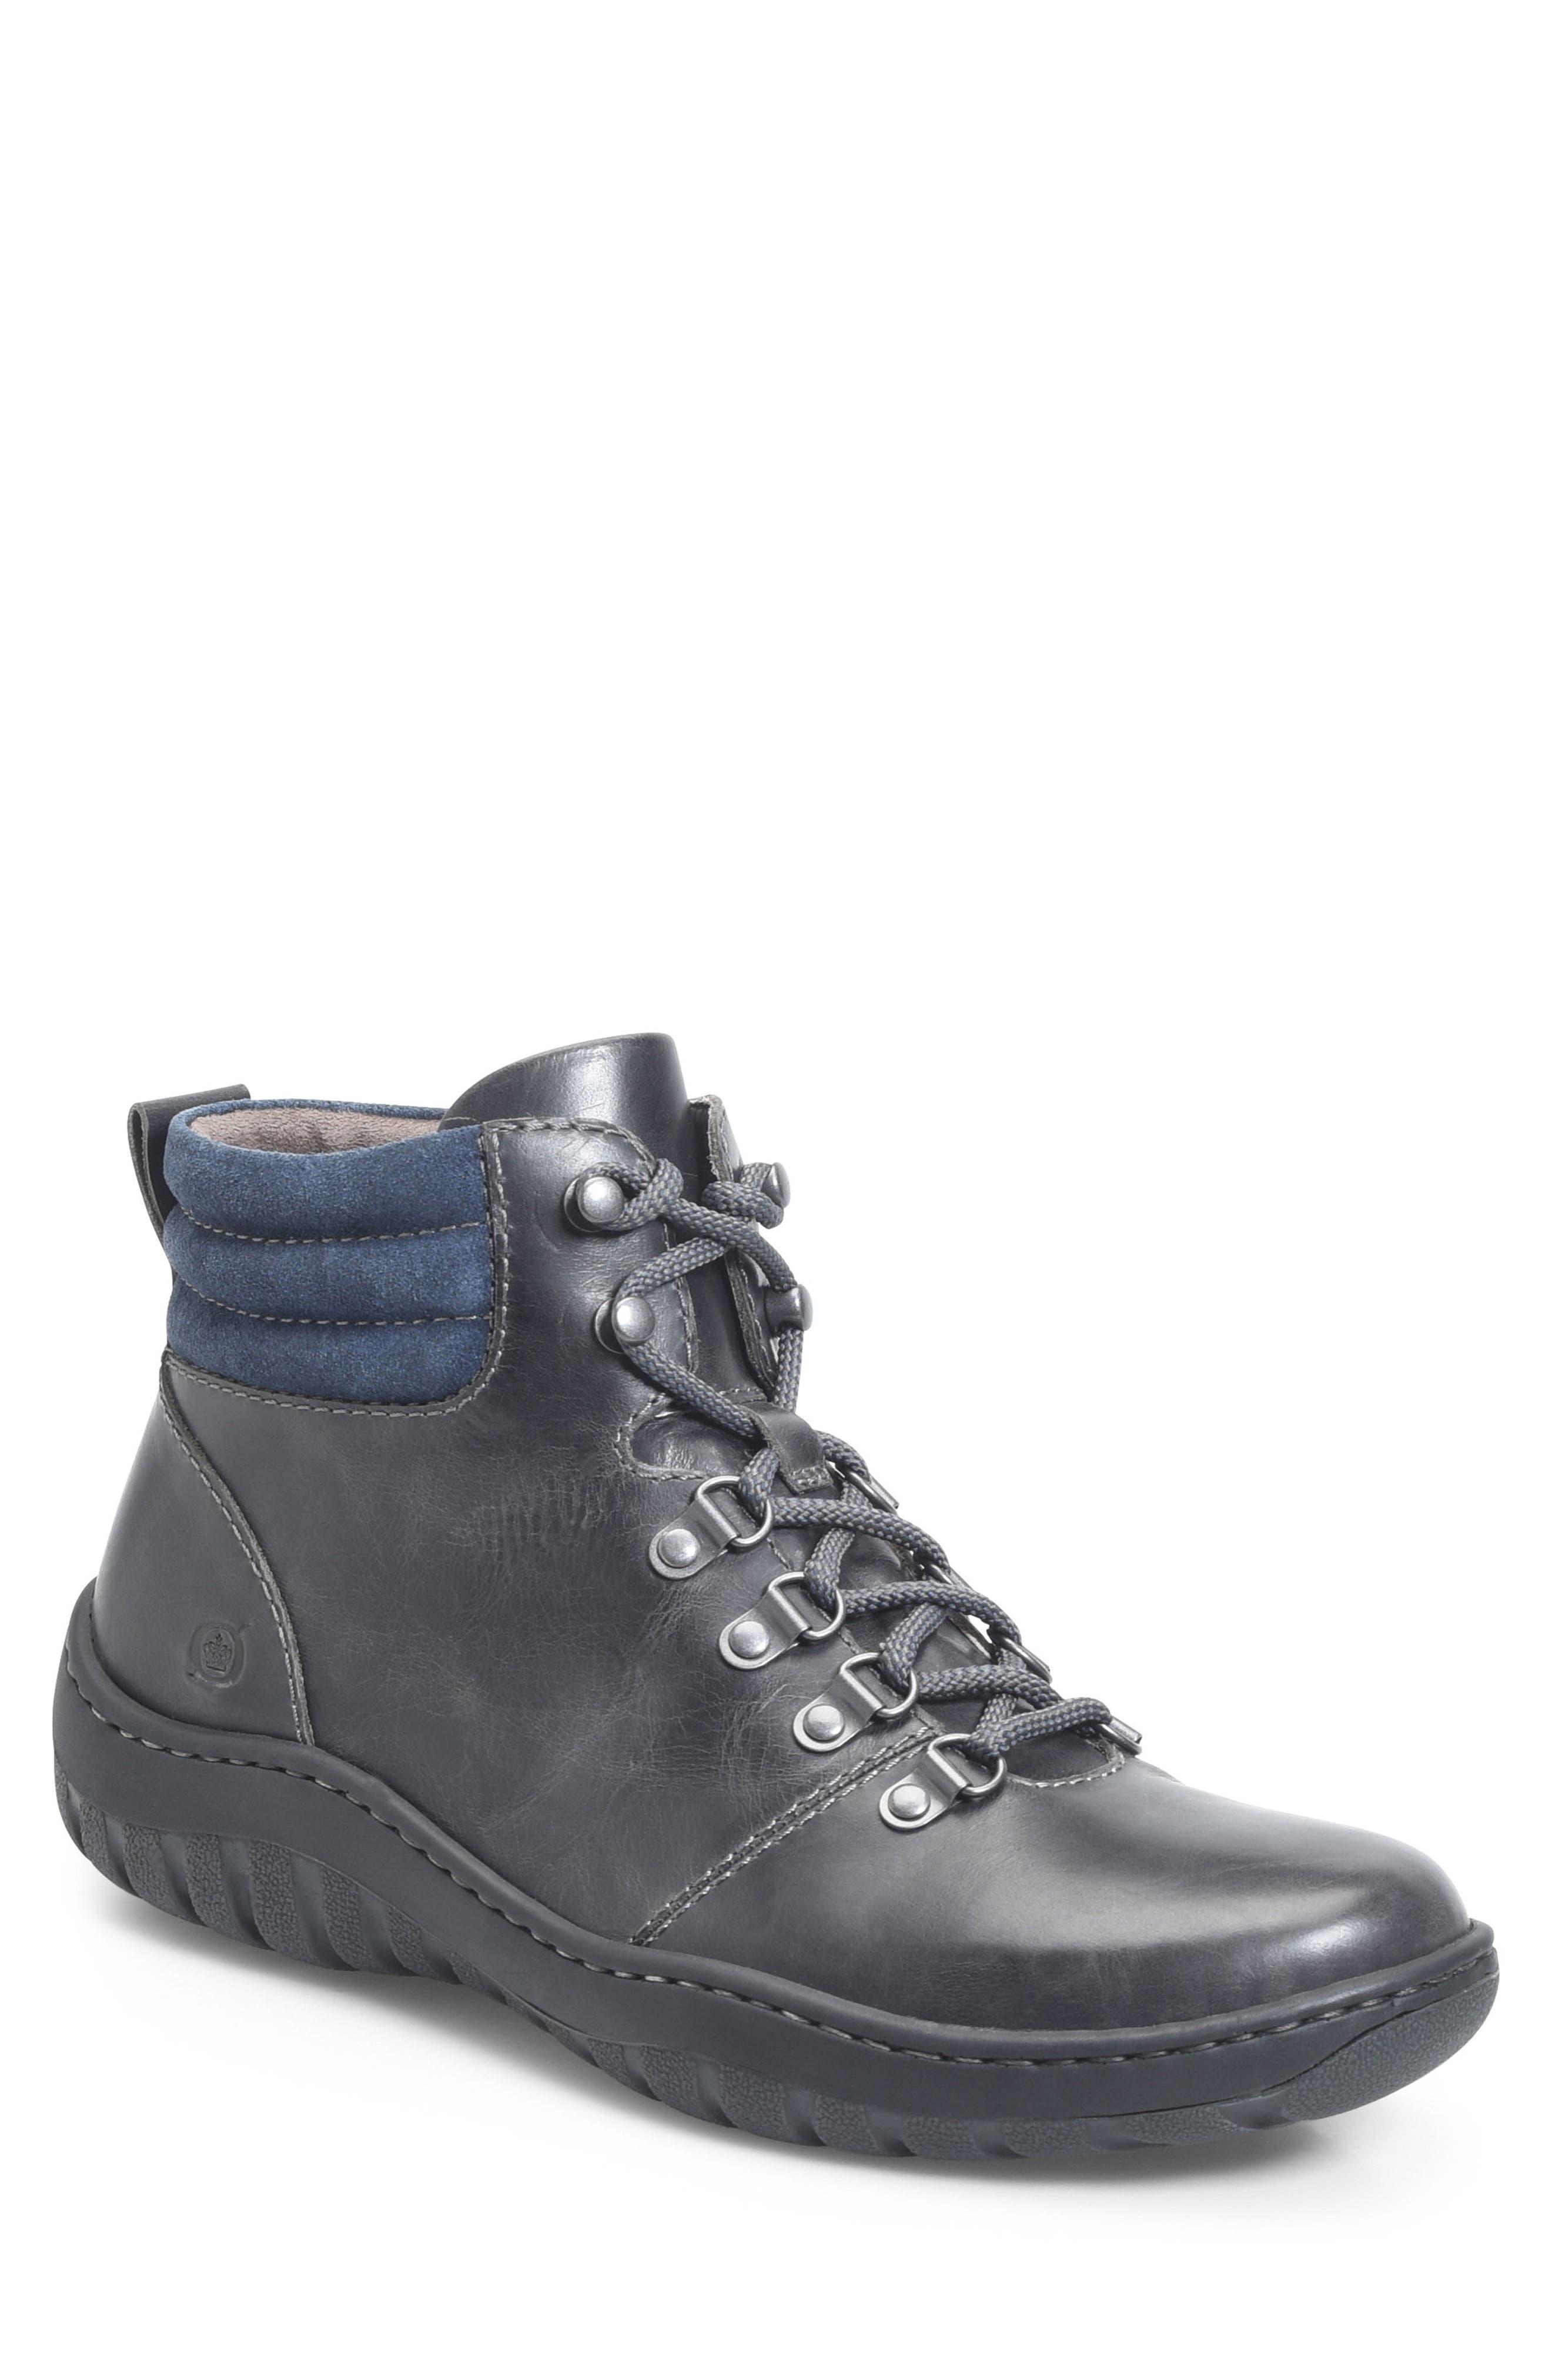 Dutchman Plain Toe Boot,                             Main thumbnail 1, color,                             DARK GREY/ BLUE